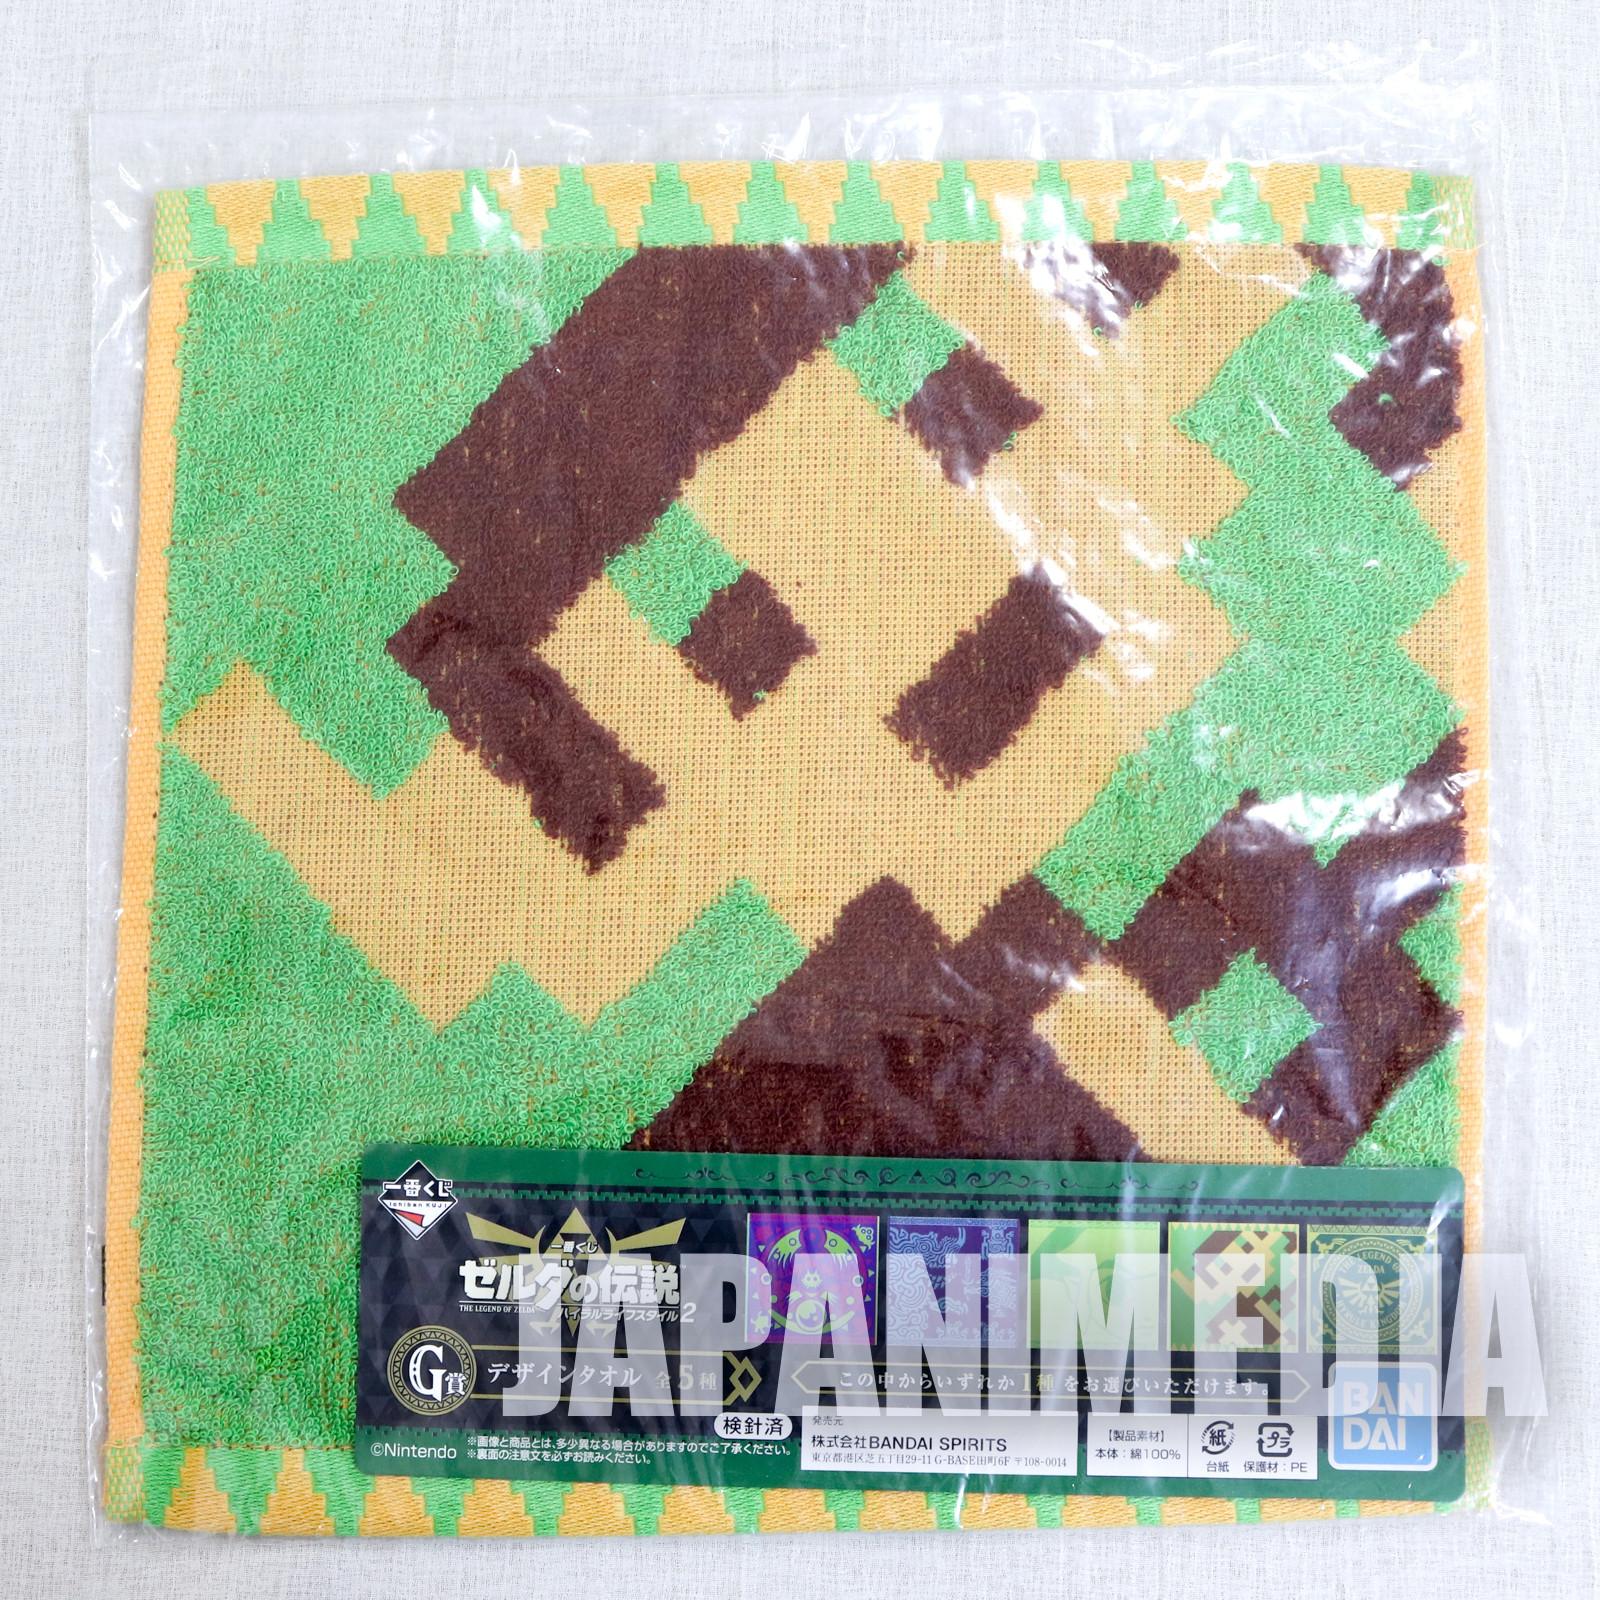 The Legend of Zelda Hyrule Life Design Towel 10x10 inch #4 Nintendo BANDAI